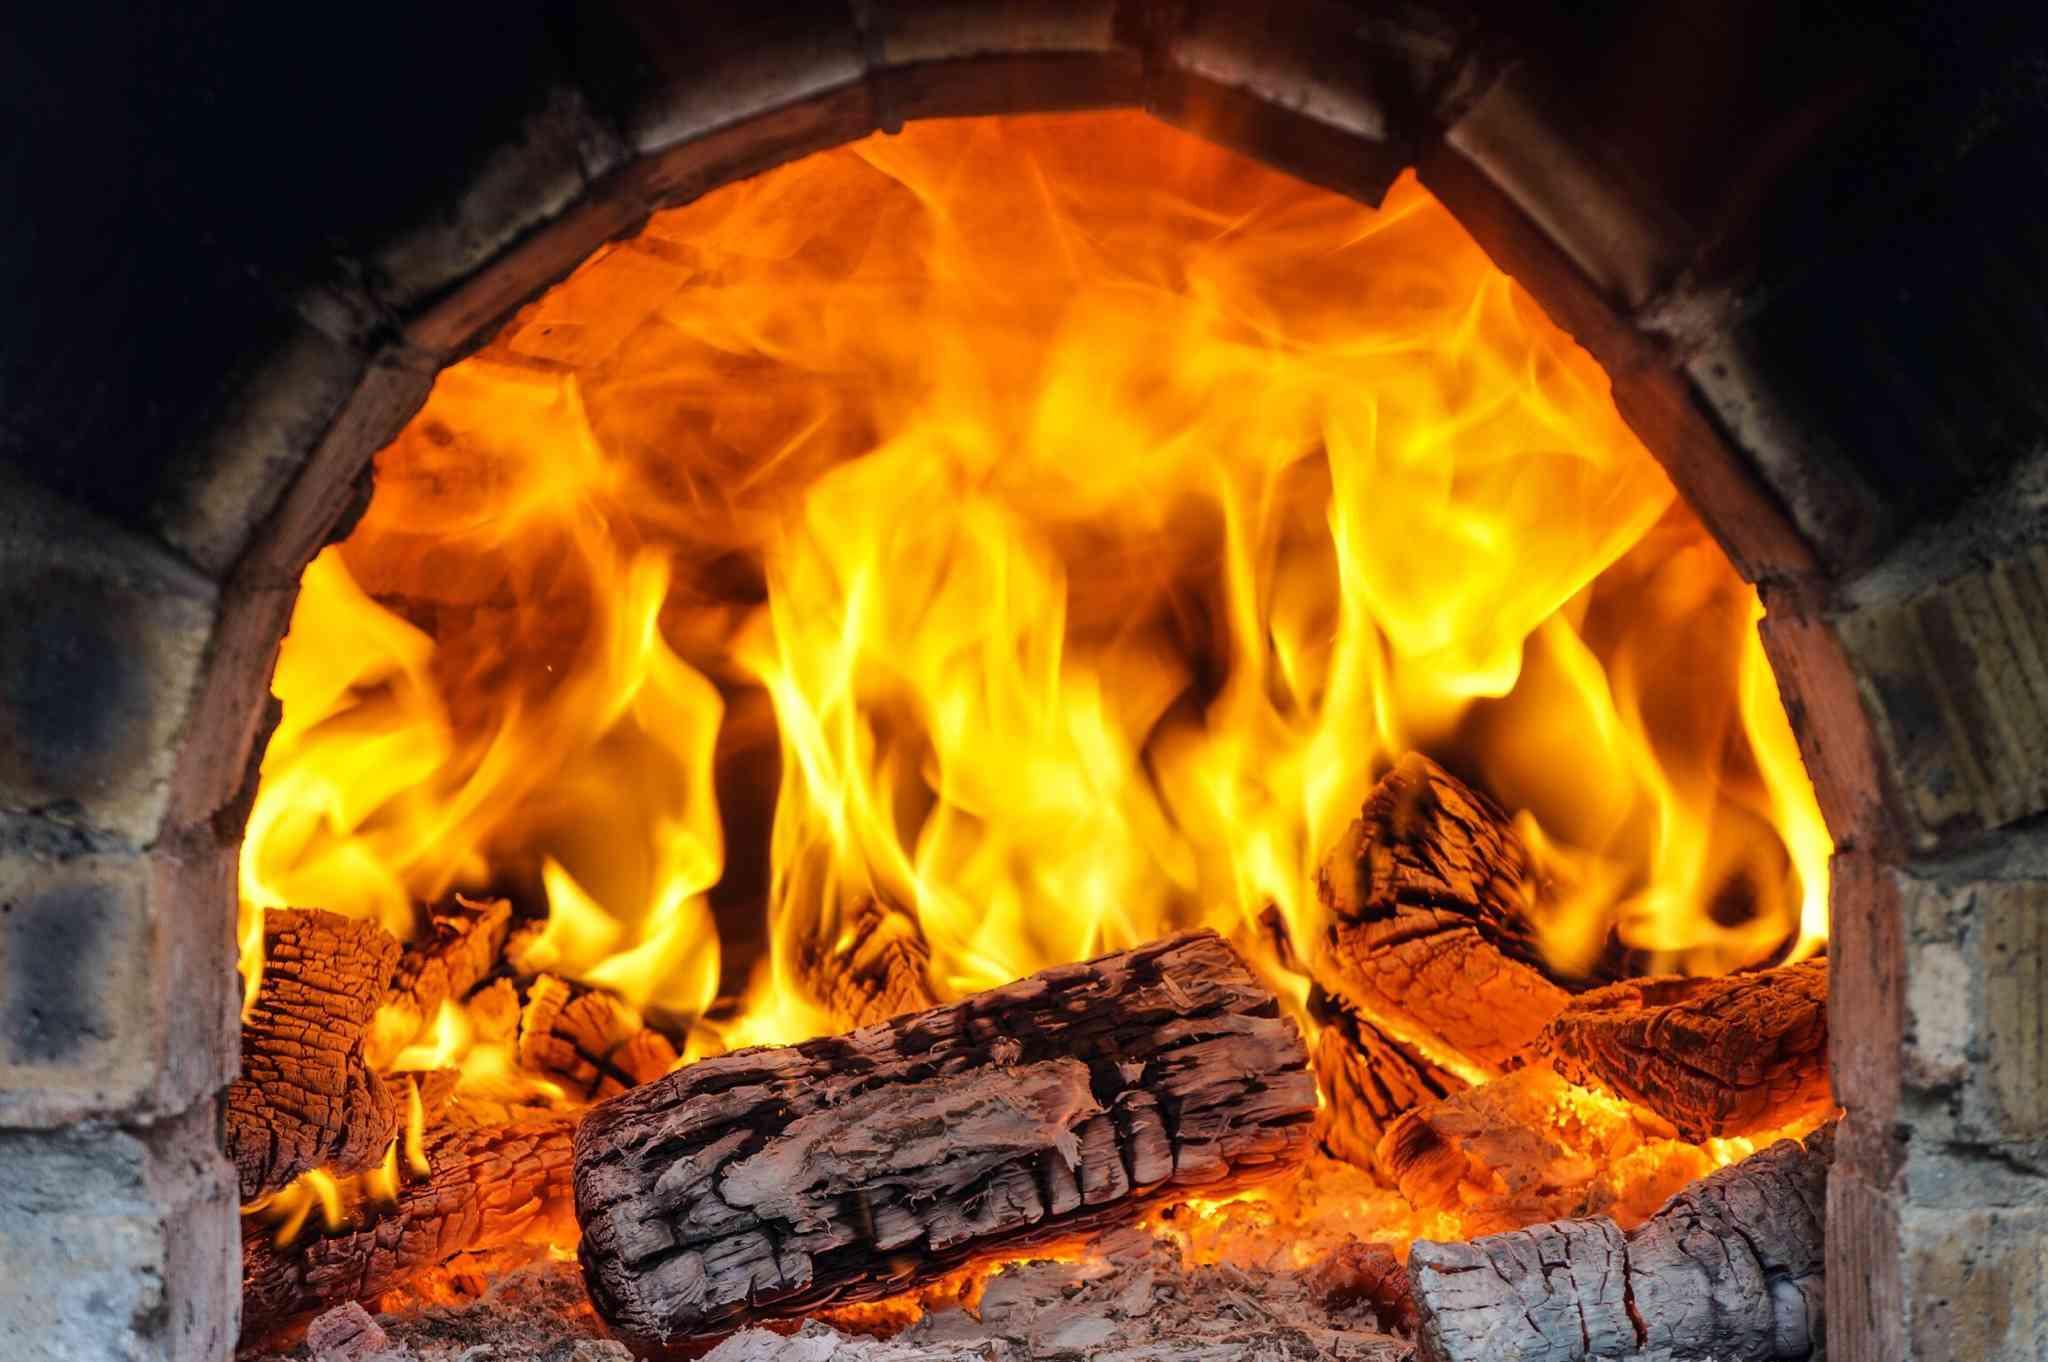 Logs Burning In Fireplace